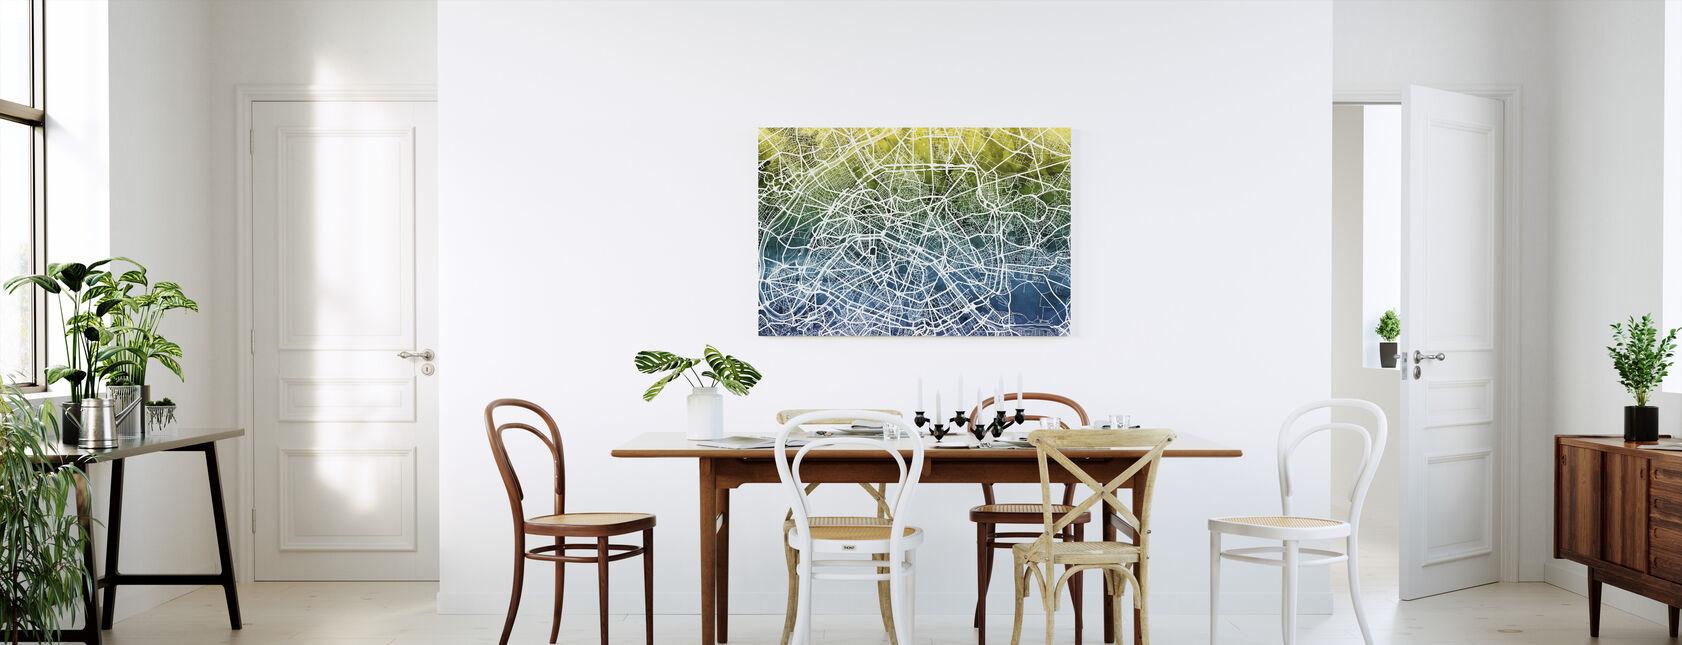 Paris Street Map Bluegreen - Canvas print - Kitchen